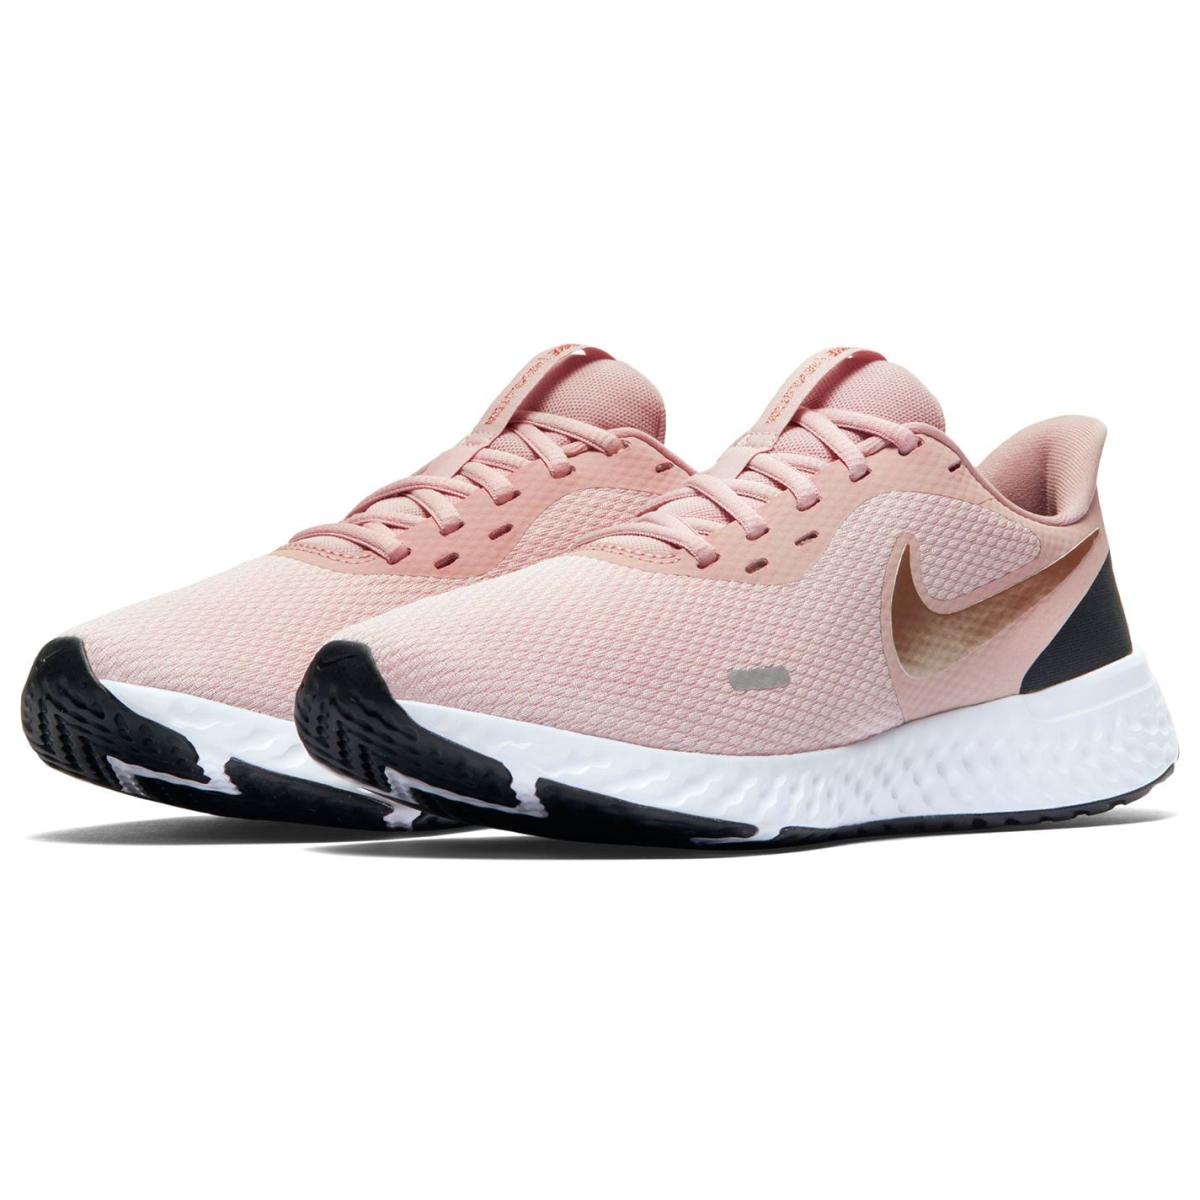 Nike-Revolution-Turnschuhe-Damen-Sneaker-Sportschuhe-Laufschuhe-1160 Indexbild 49